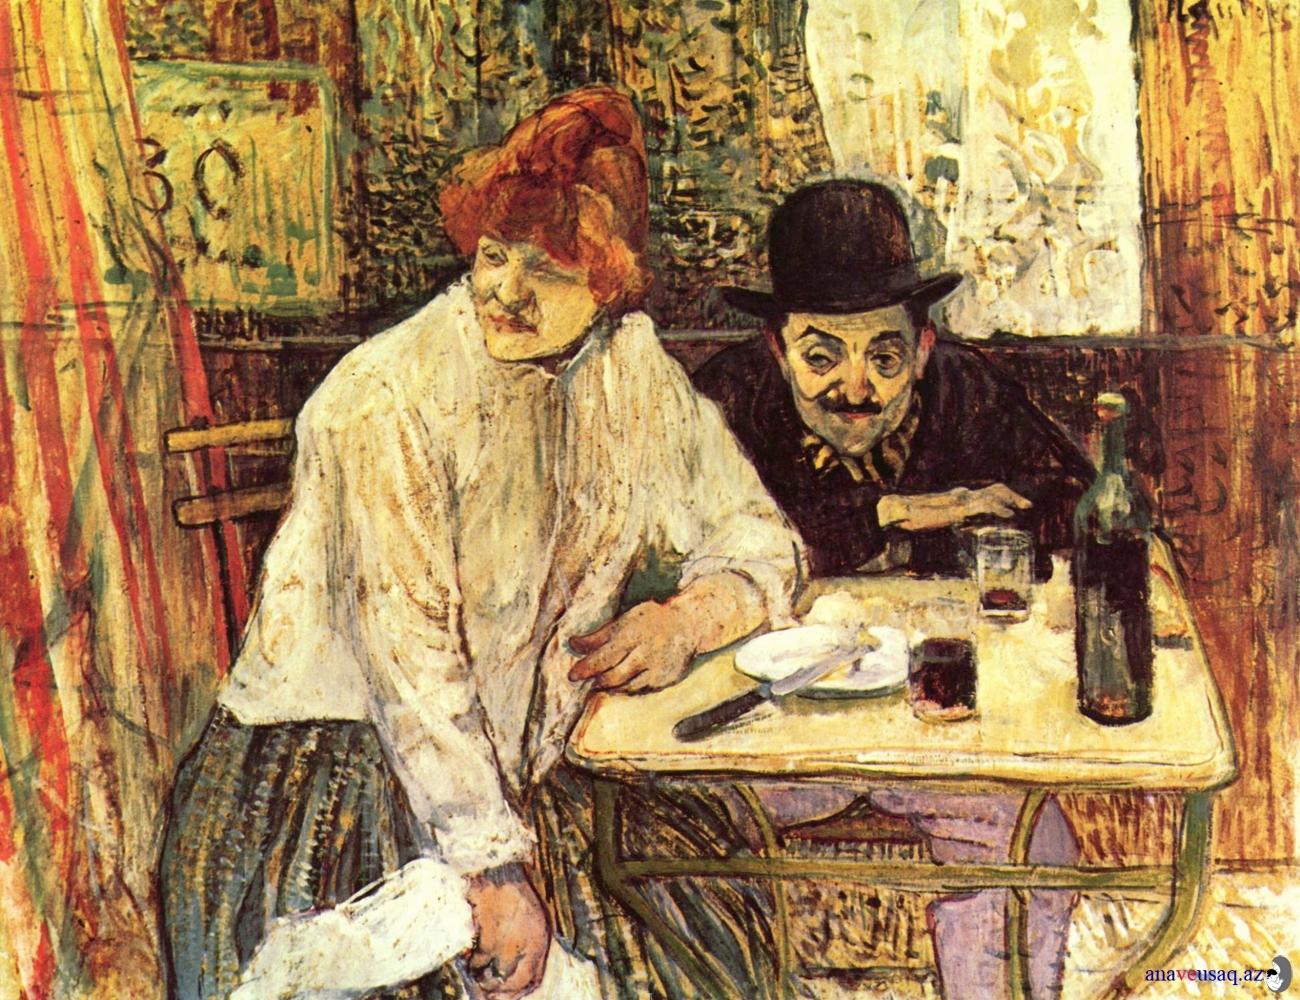 В кафе La Mie, Анри де Тулуз Лотрек, импрессионизм